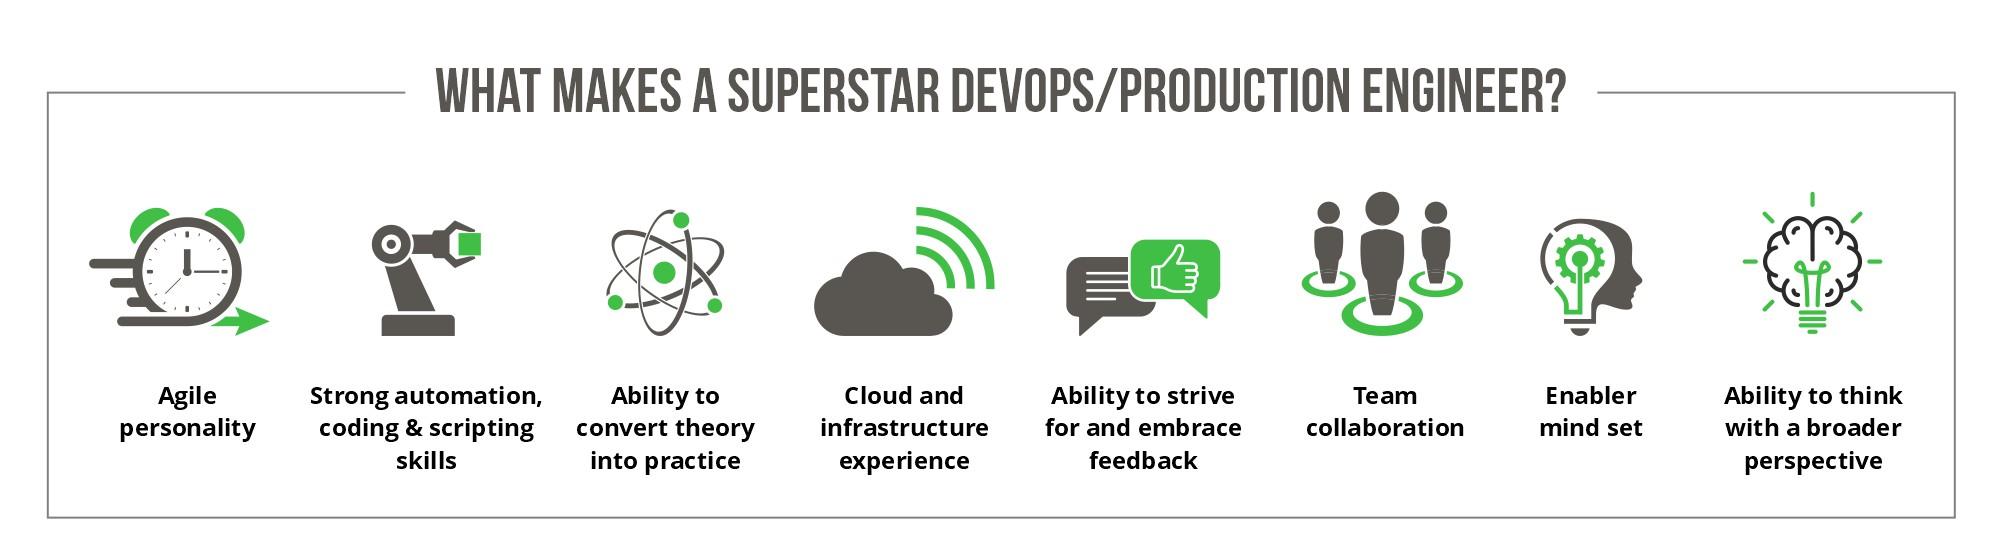 What Makes a Superstar DevOps/Production Engineer